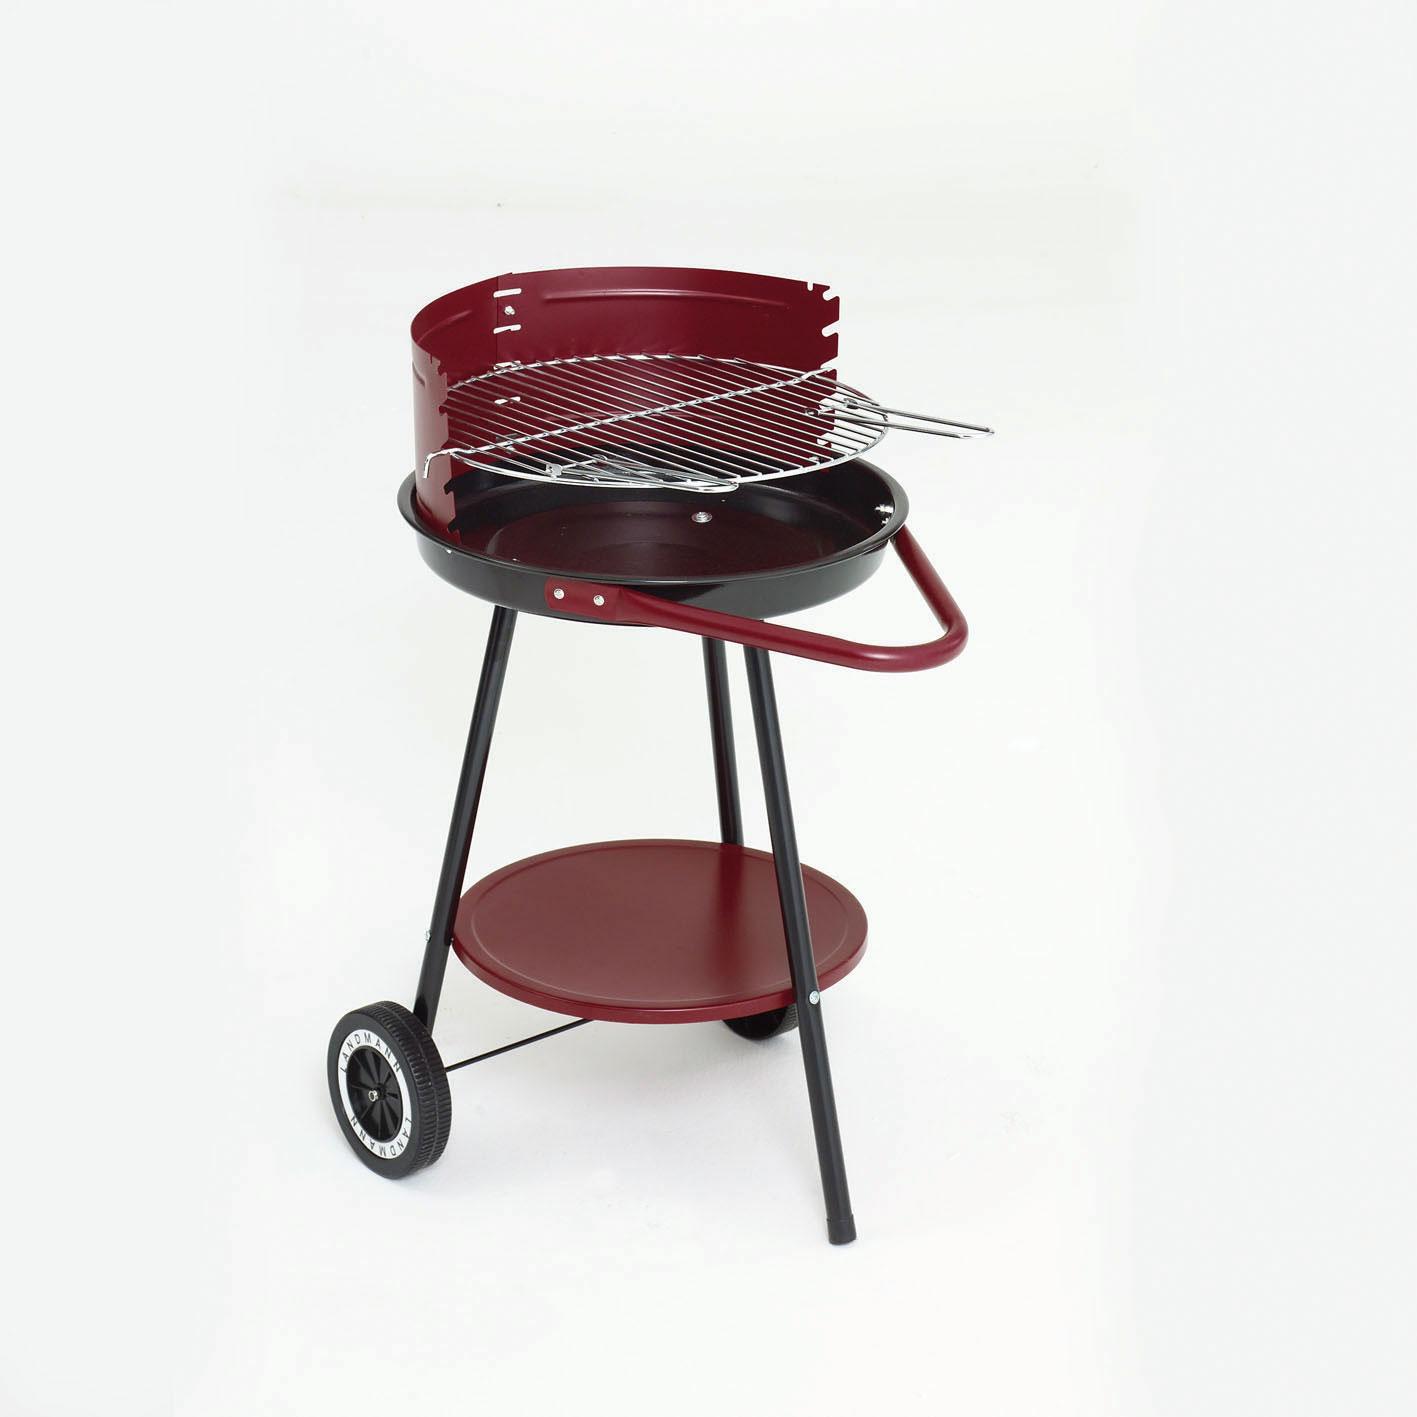 [Amazon] Grillchef by Landmann Holzkohle - Rundgrill 52 x 60 x 77,5 cm für 18,56€